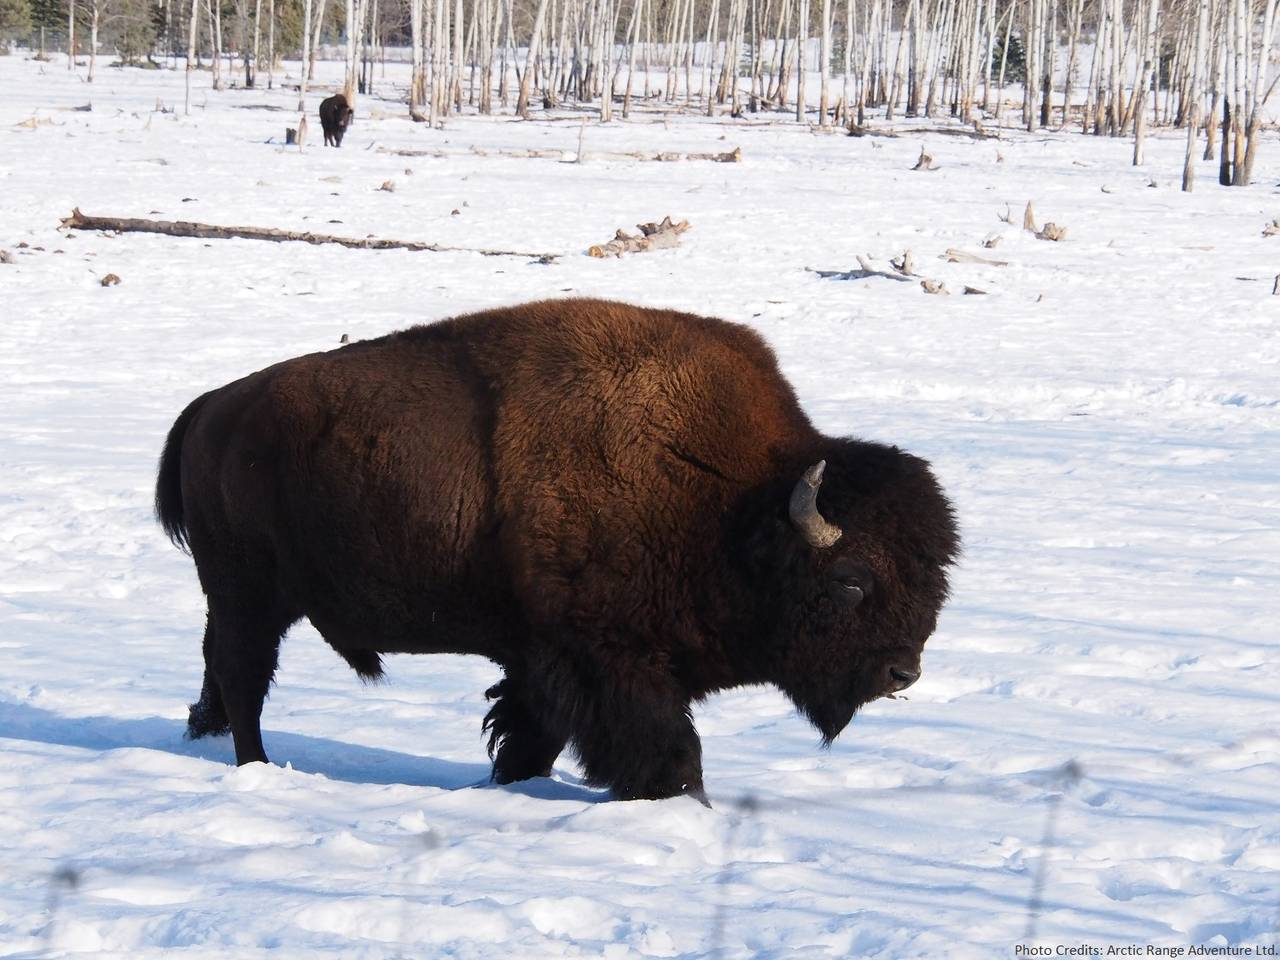 Bison of the Yukon